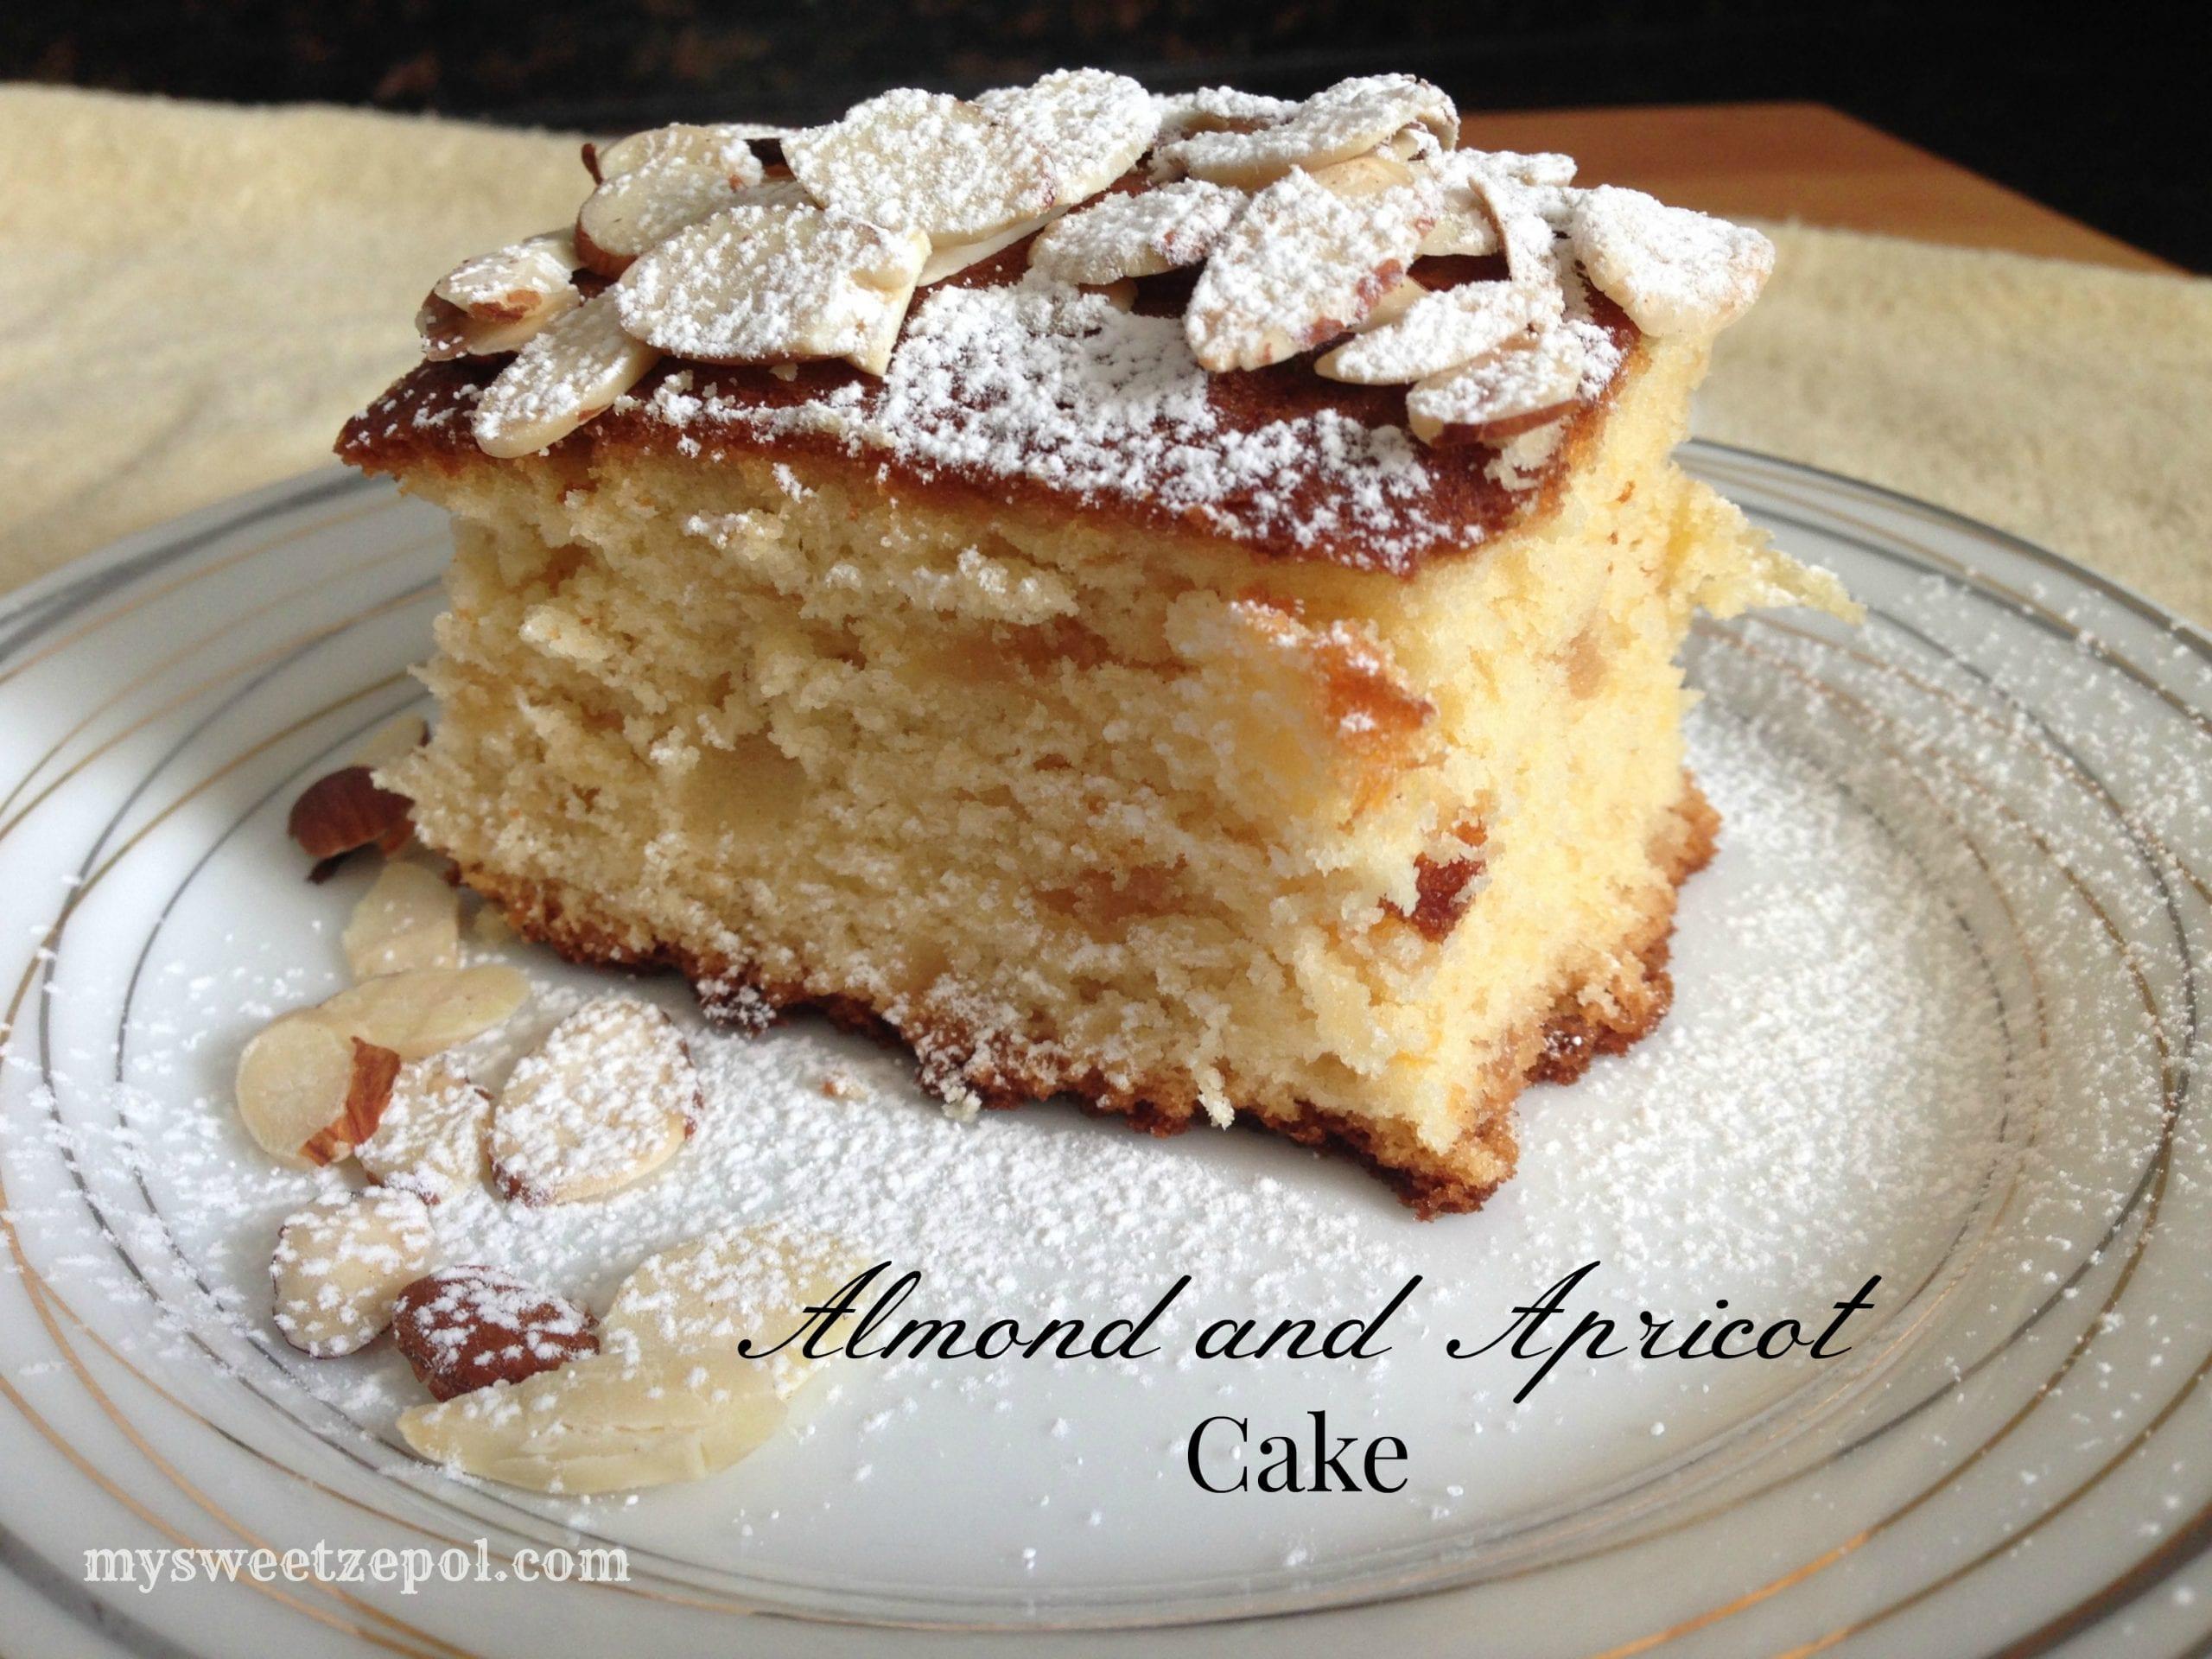 058c715de0f794 cake Archives - My Sweet Zepol